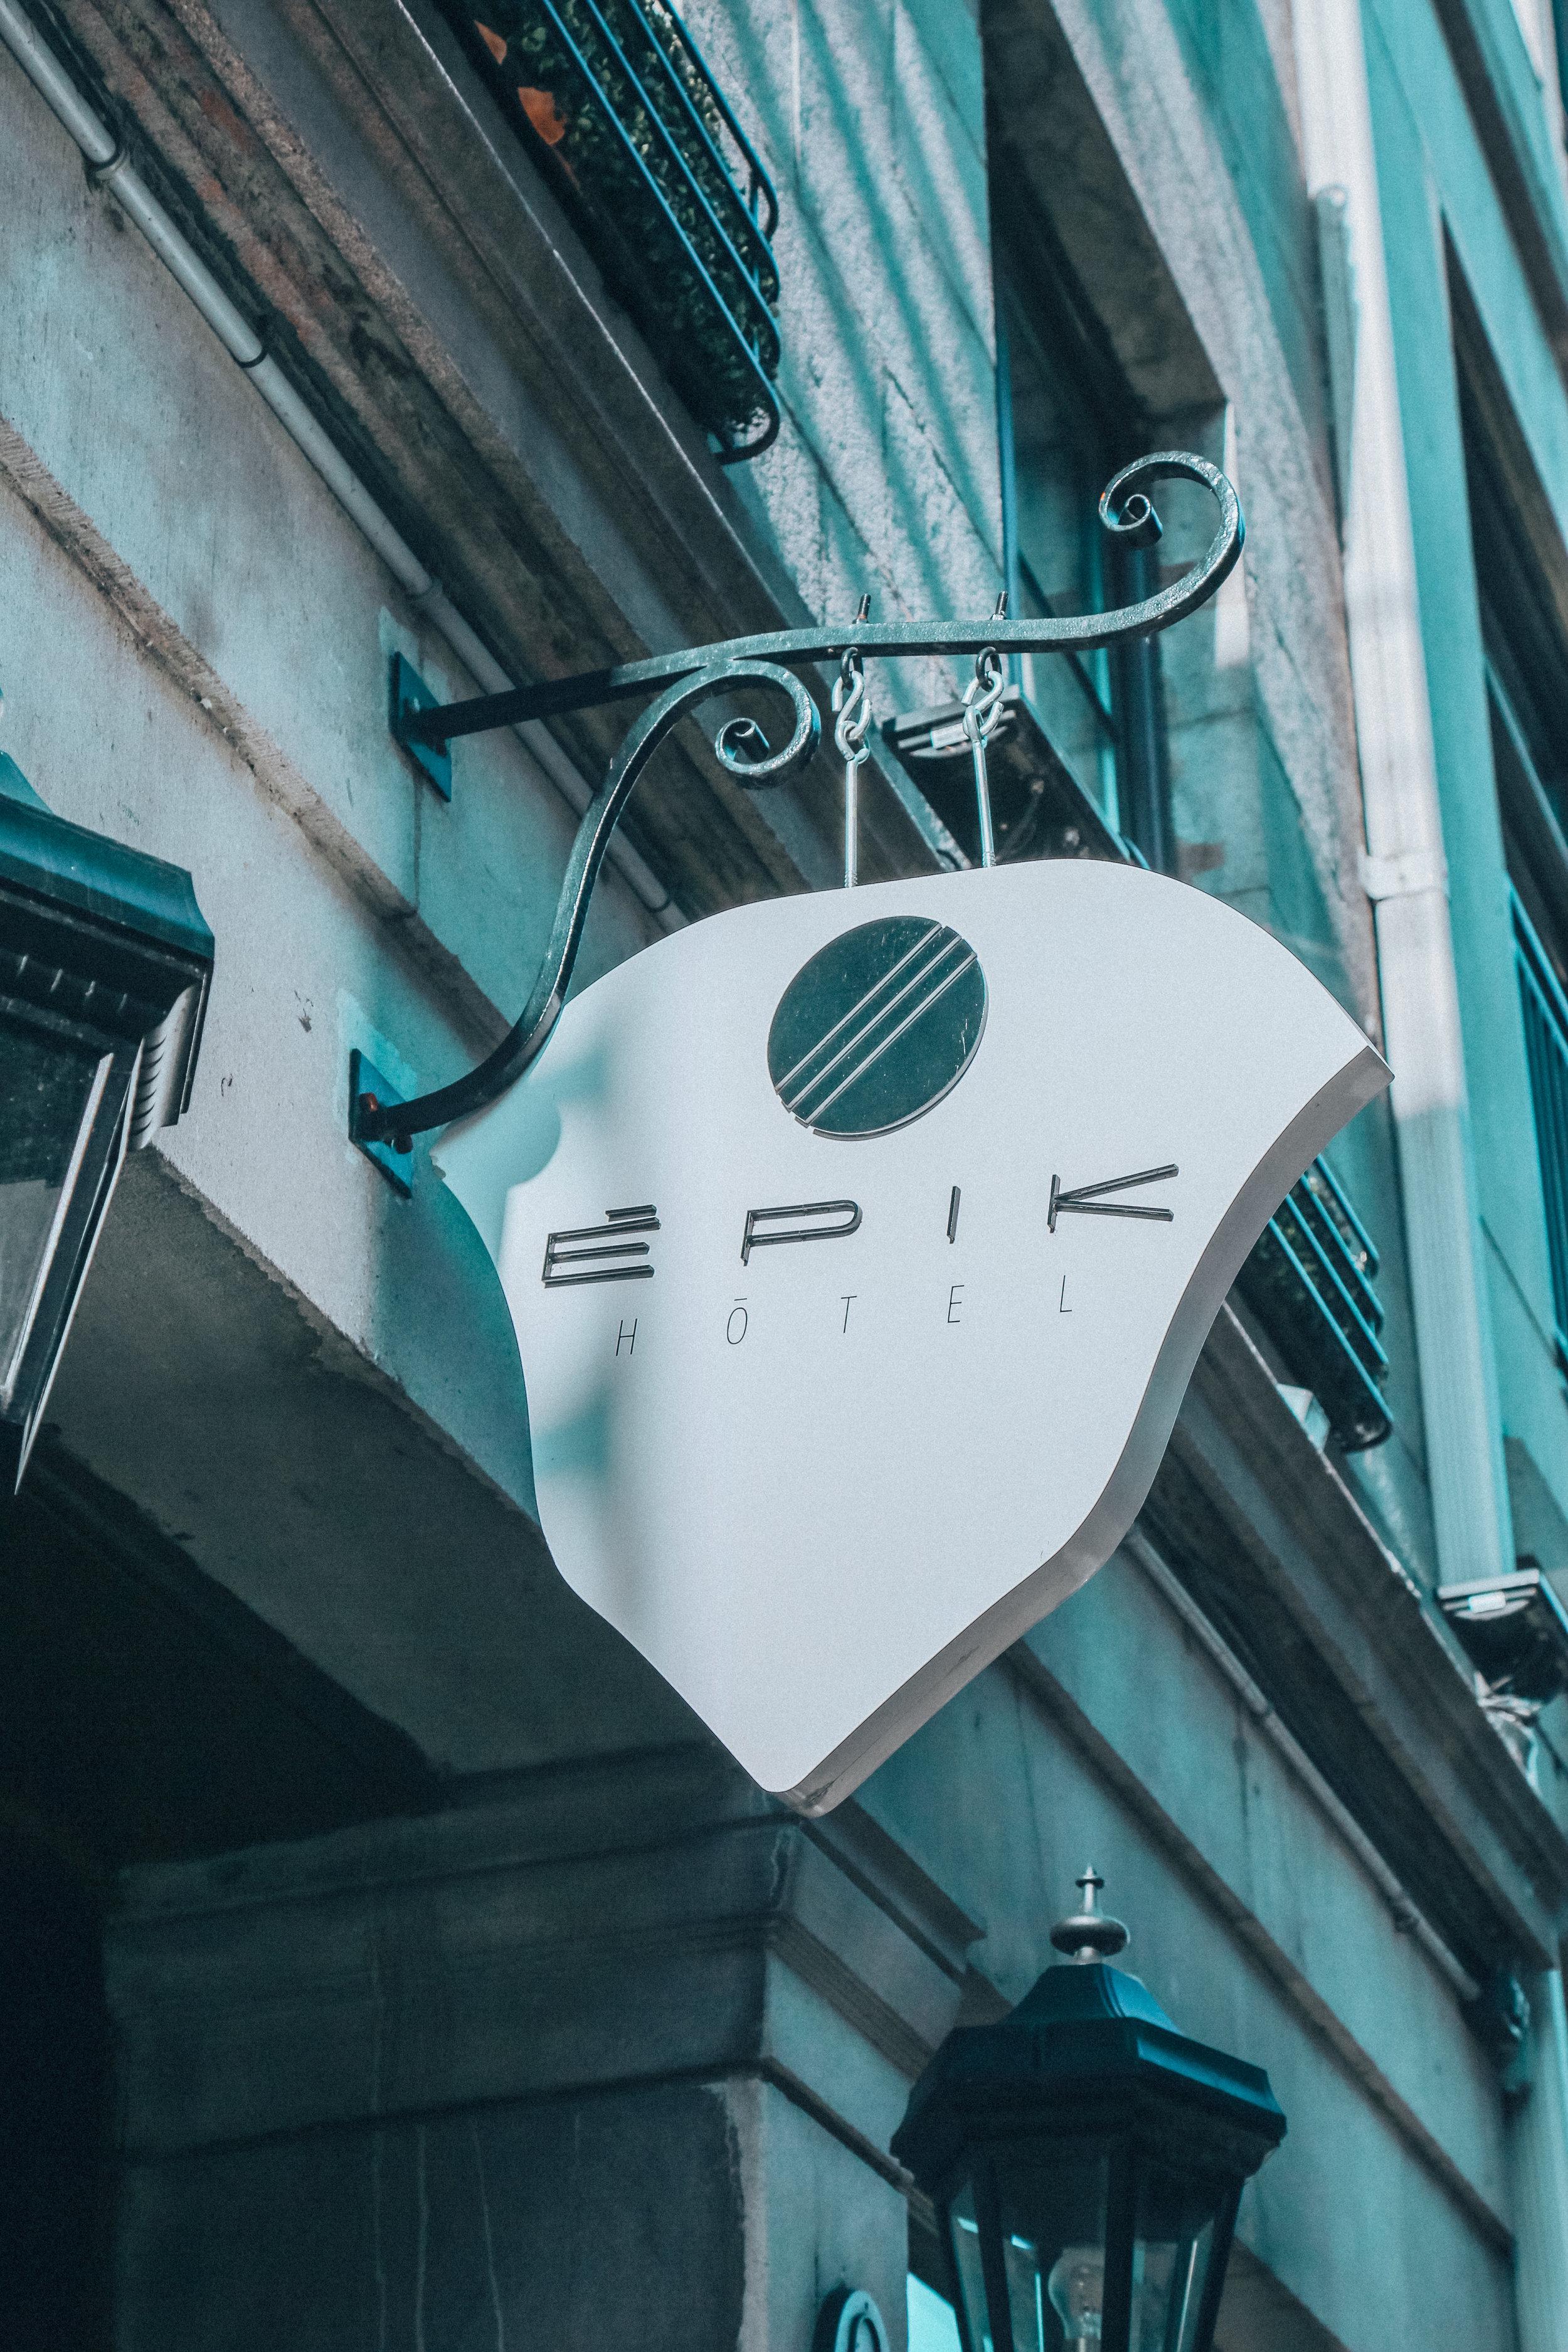 Epik Hotel